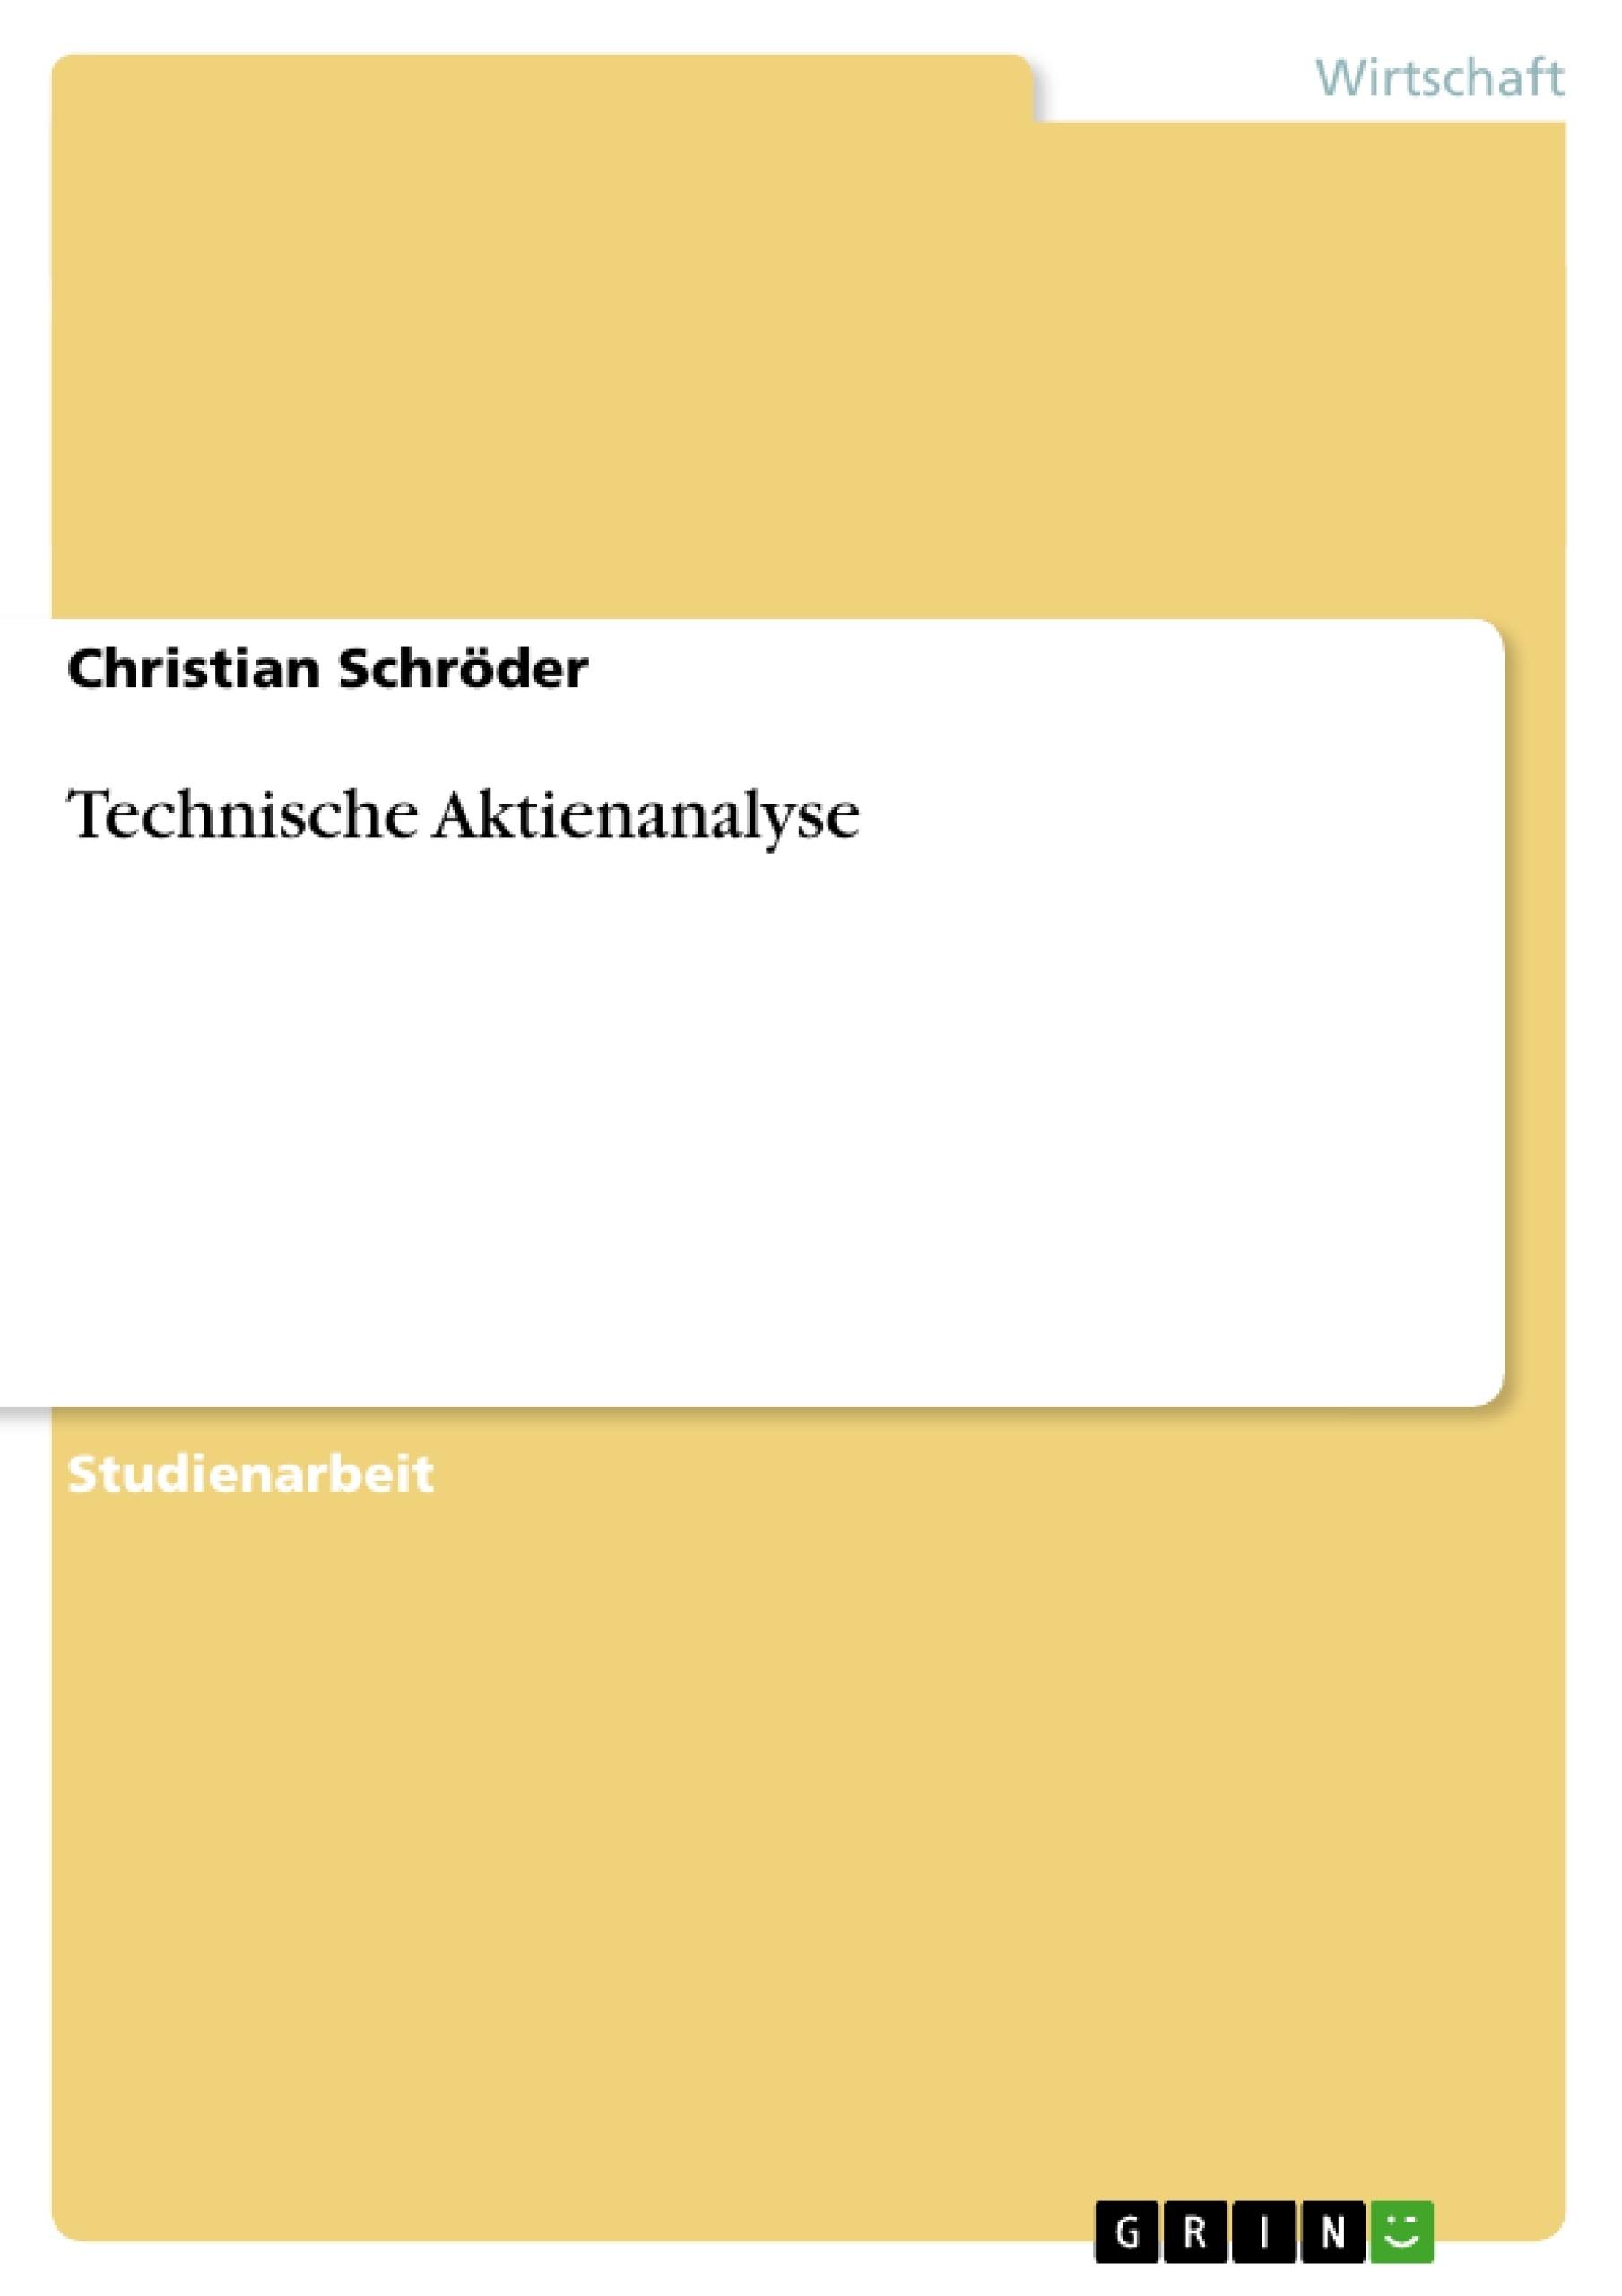 Titel: Technische Aktienanalyse